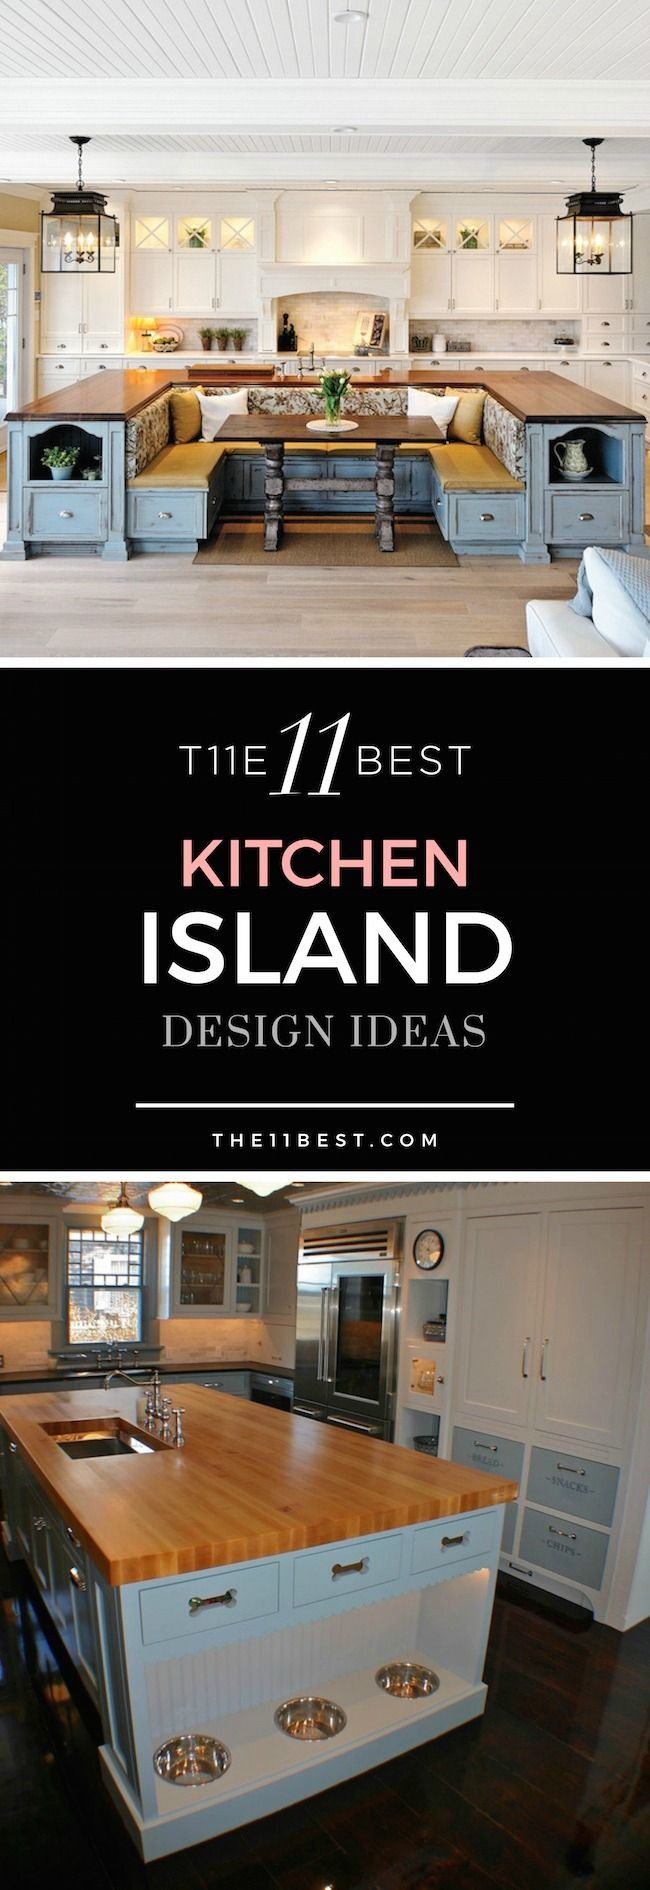 Eleven Contemporary Kitchen The 11 Best Kitchen Islands The Eleven Best Http Centophobe